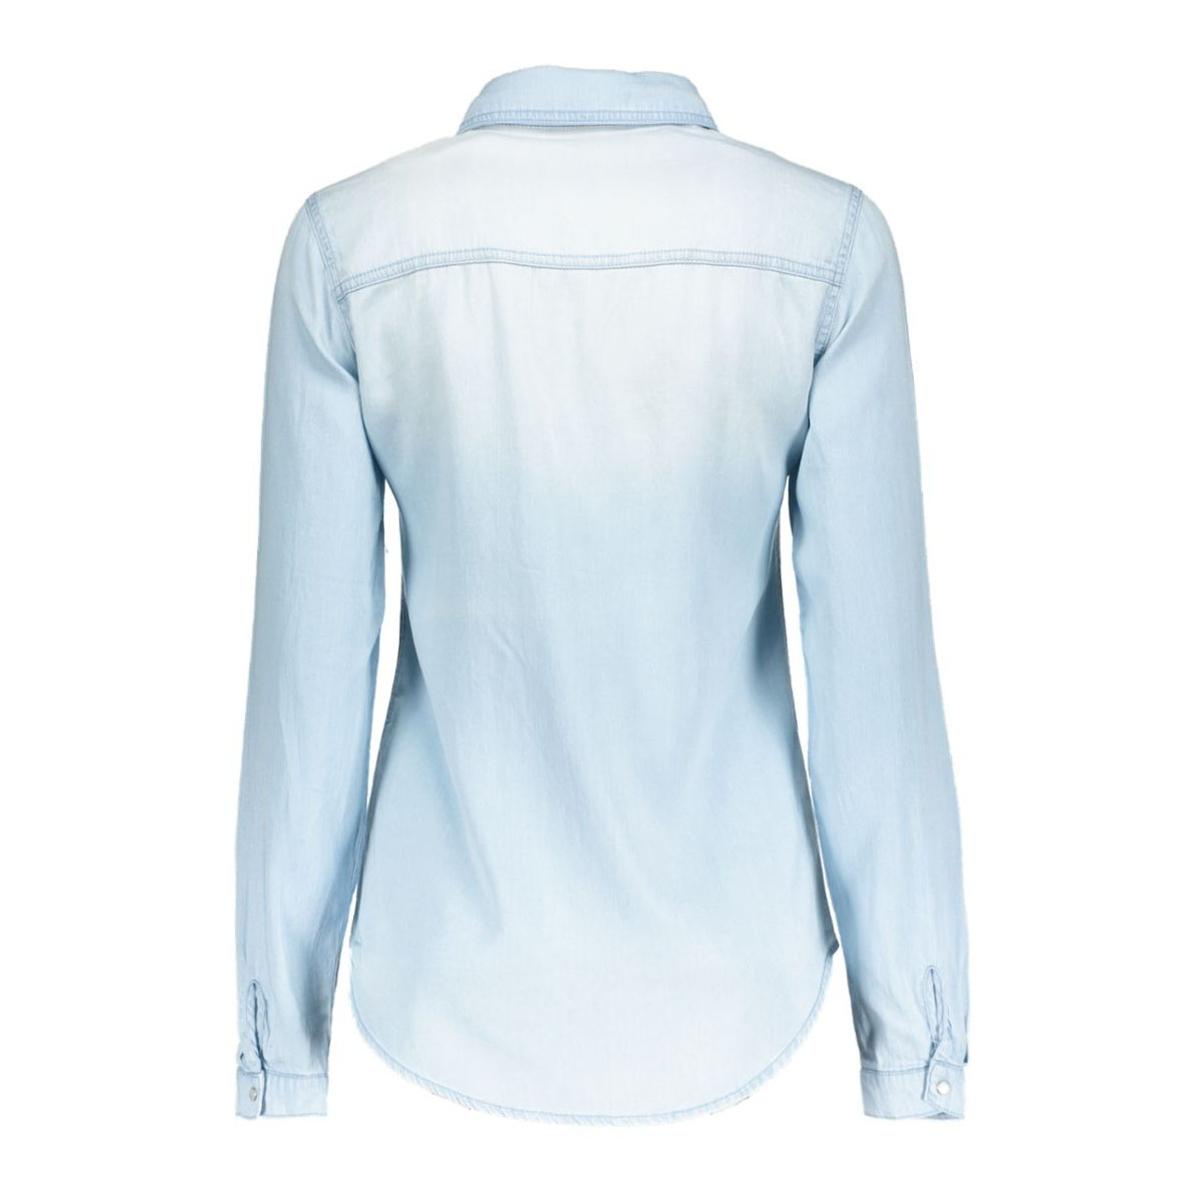 vibista denim shirt 1 14033008 vila blouse light blue denim